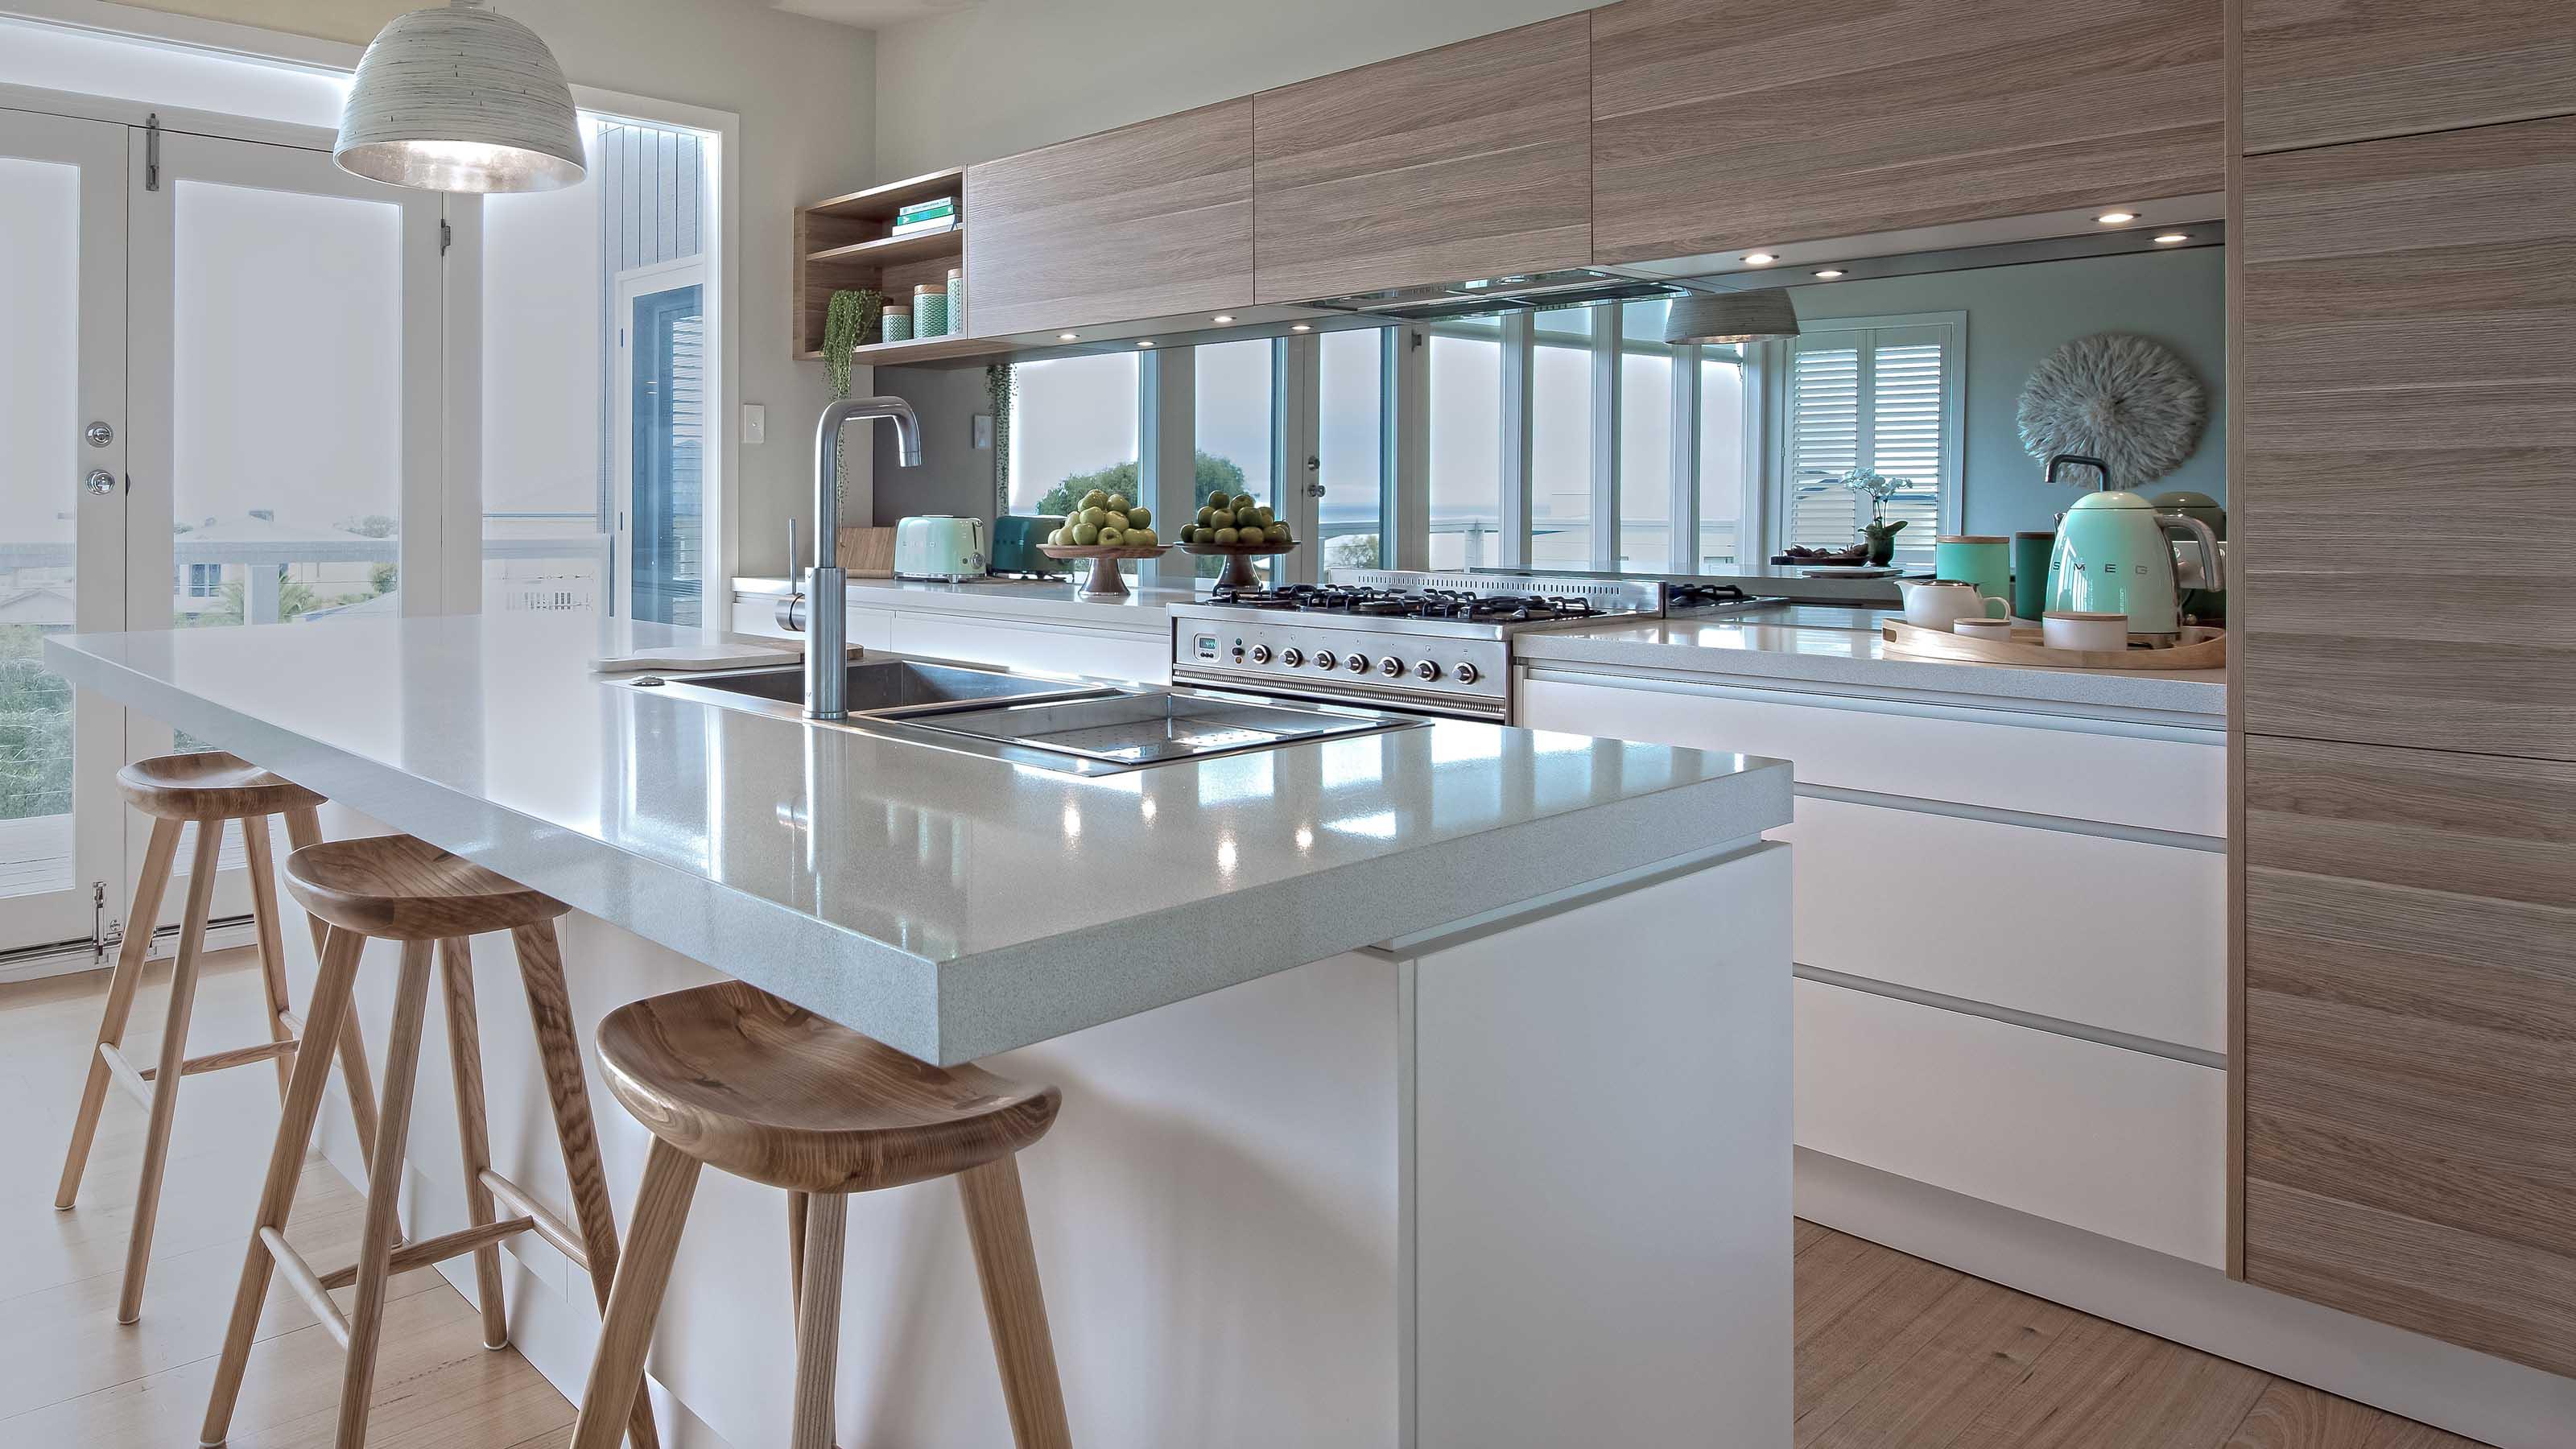 Кухонный фартук из зеркальных панелей